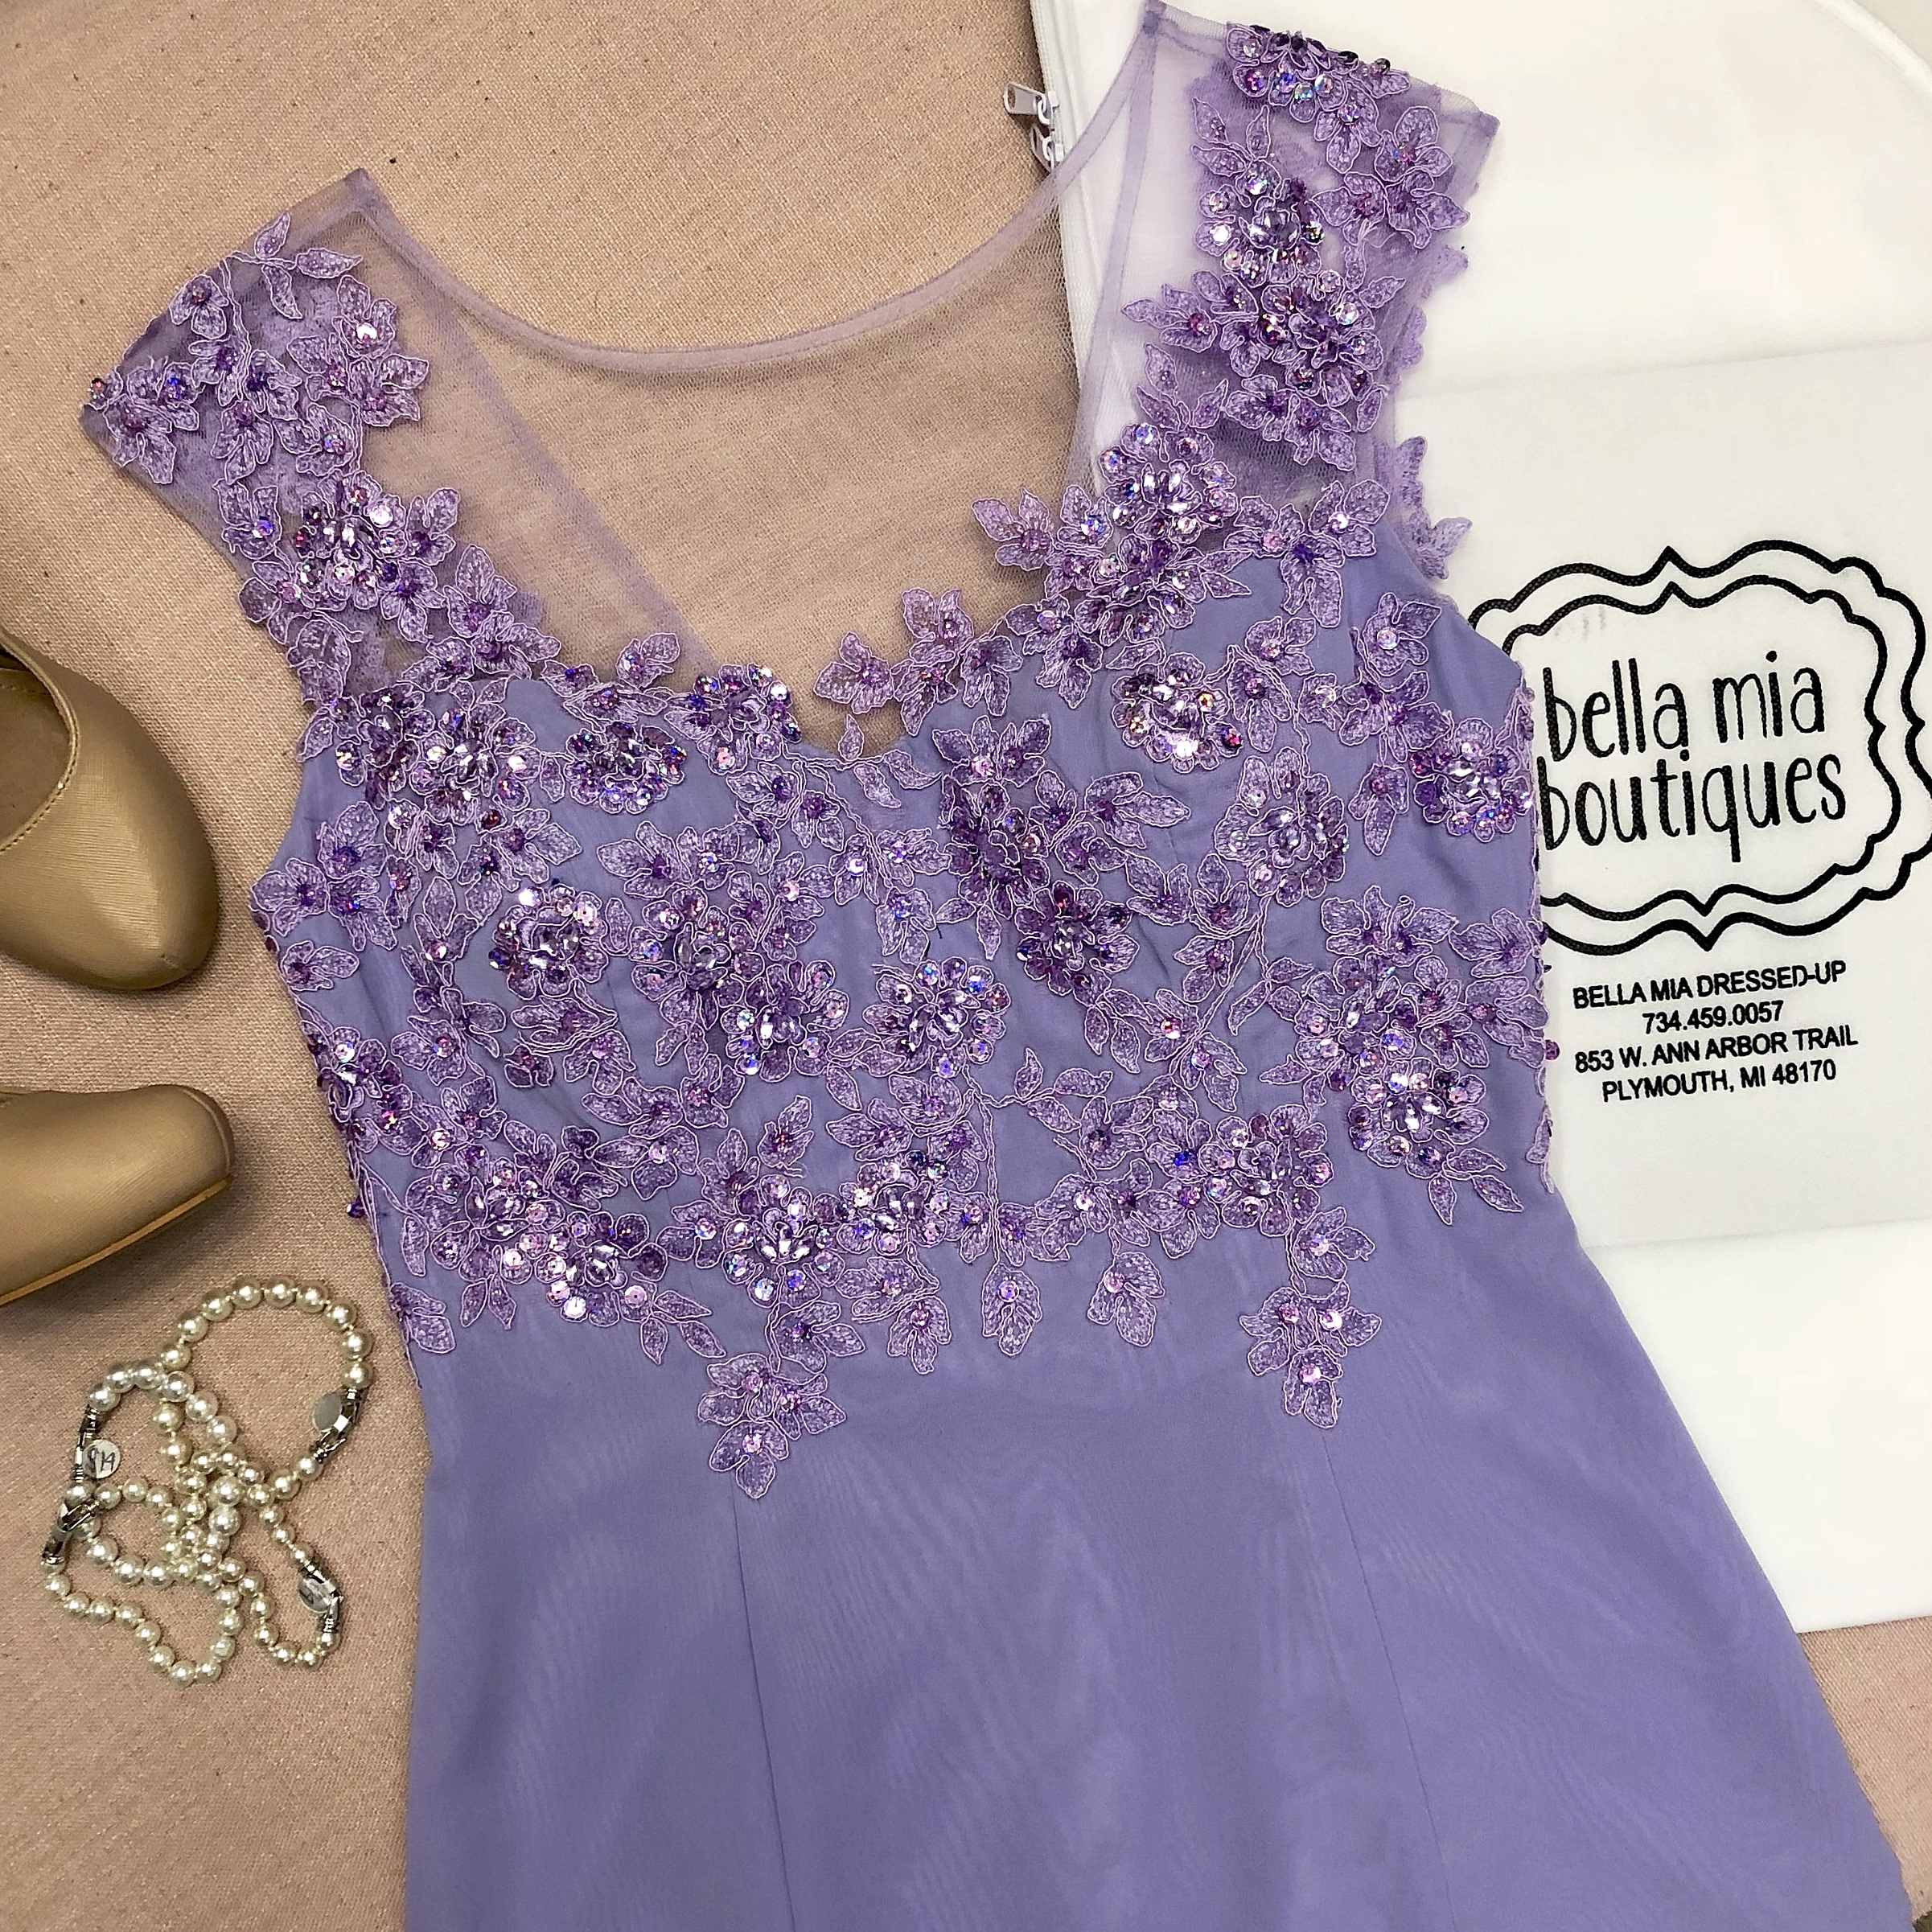 Bella-Mia-Dressed-Up-Hope-Closet-Prom-Dress-Donation.jpg